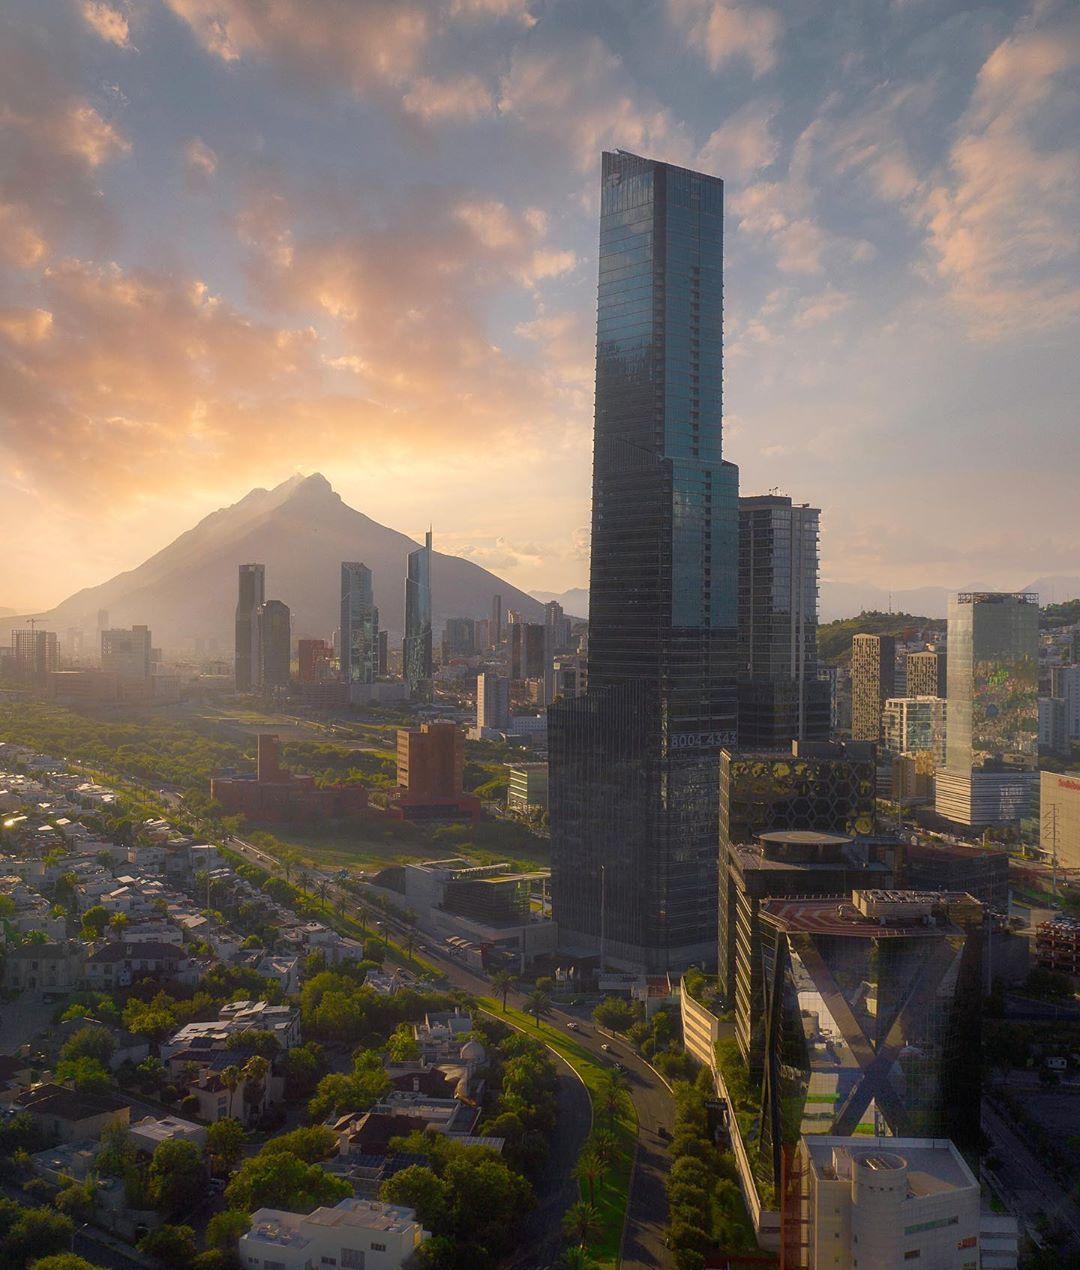 28 Monterrey, N.L I'eńor! ideas in 2021 | monterrey, mexico, holidays to  mexico